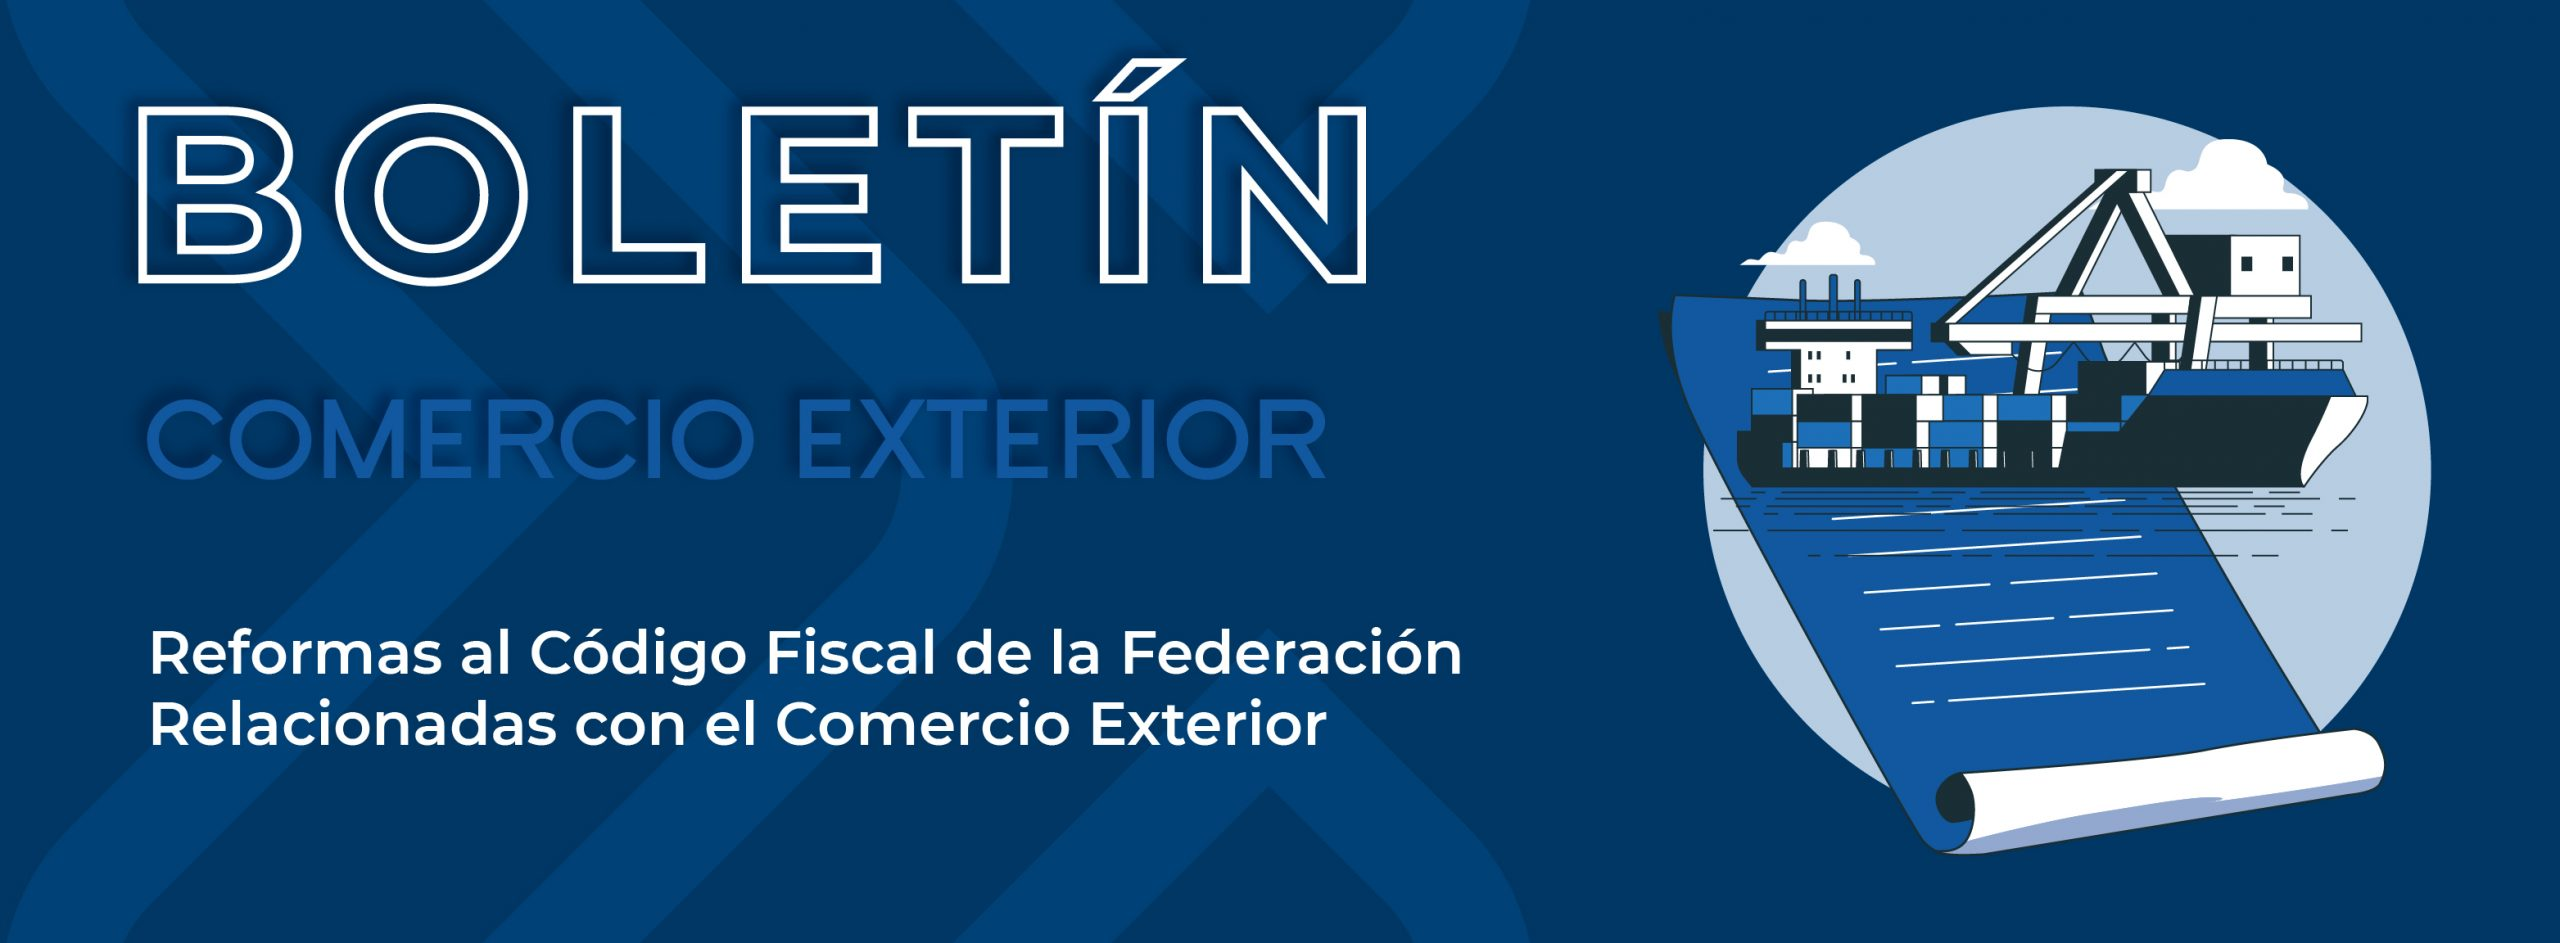 Comercio Exterrior BHR Mexico